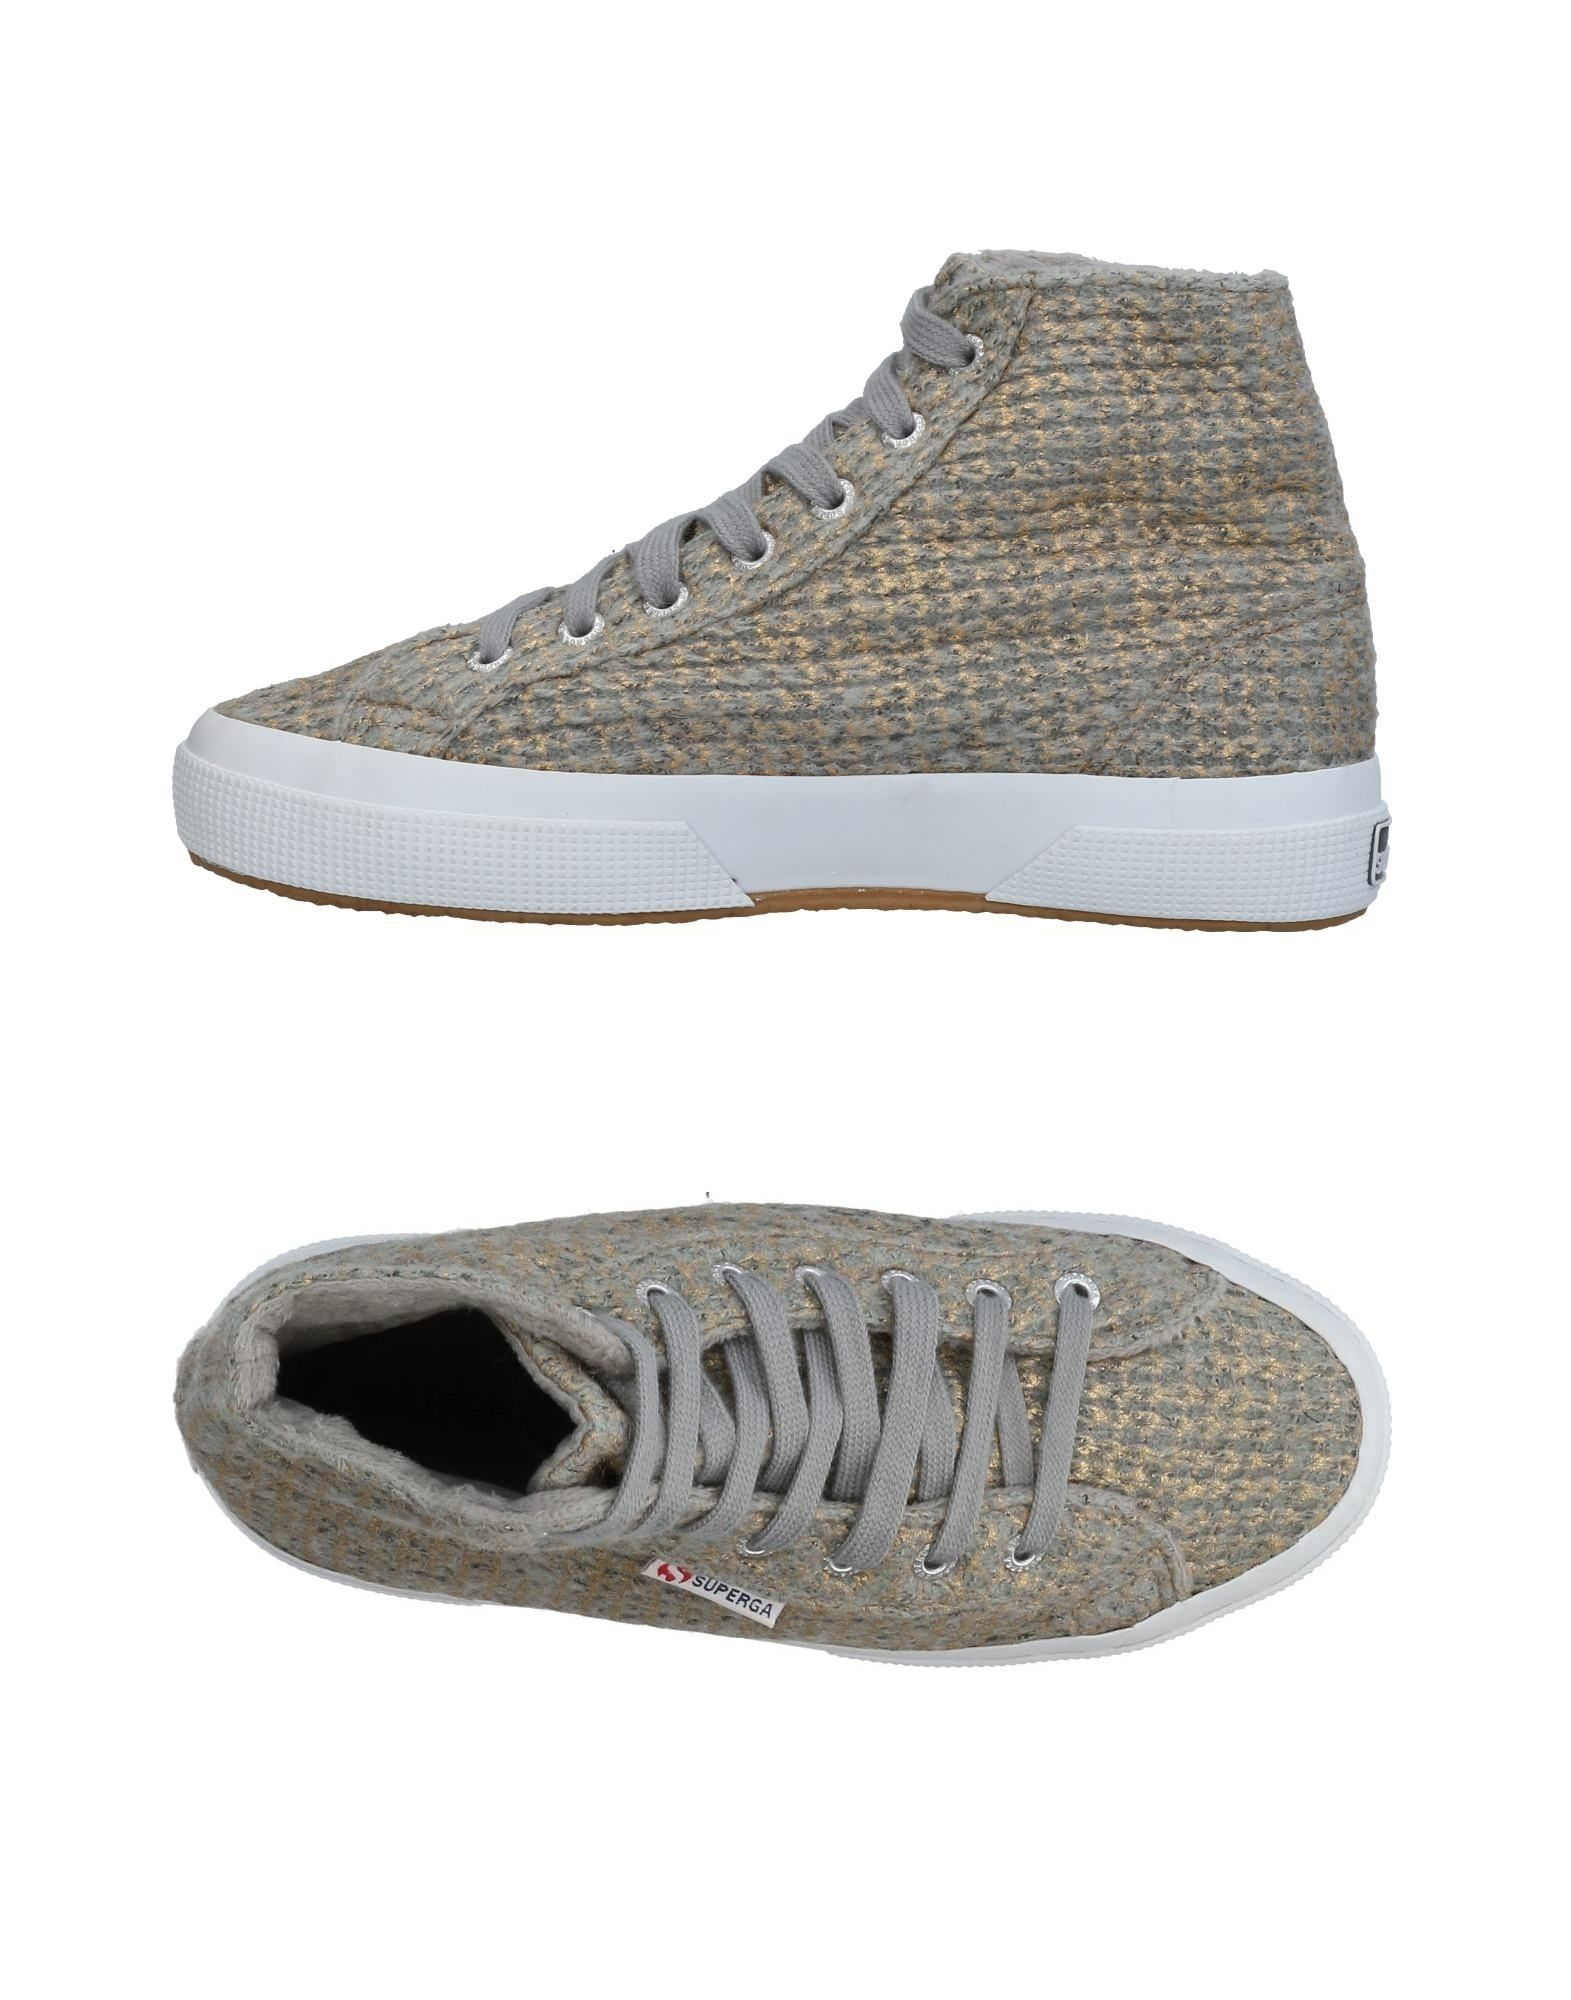 Superga®  Sneakers Damen  11438380CS  Superga® c82922